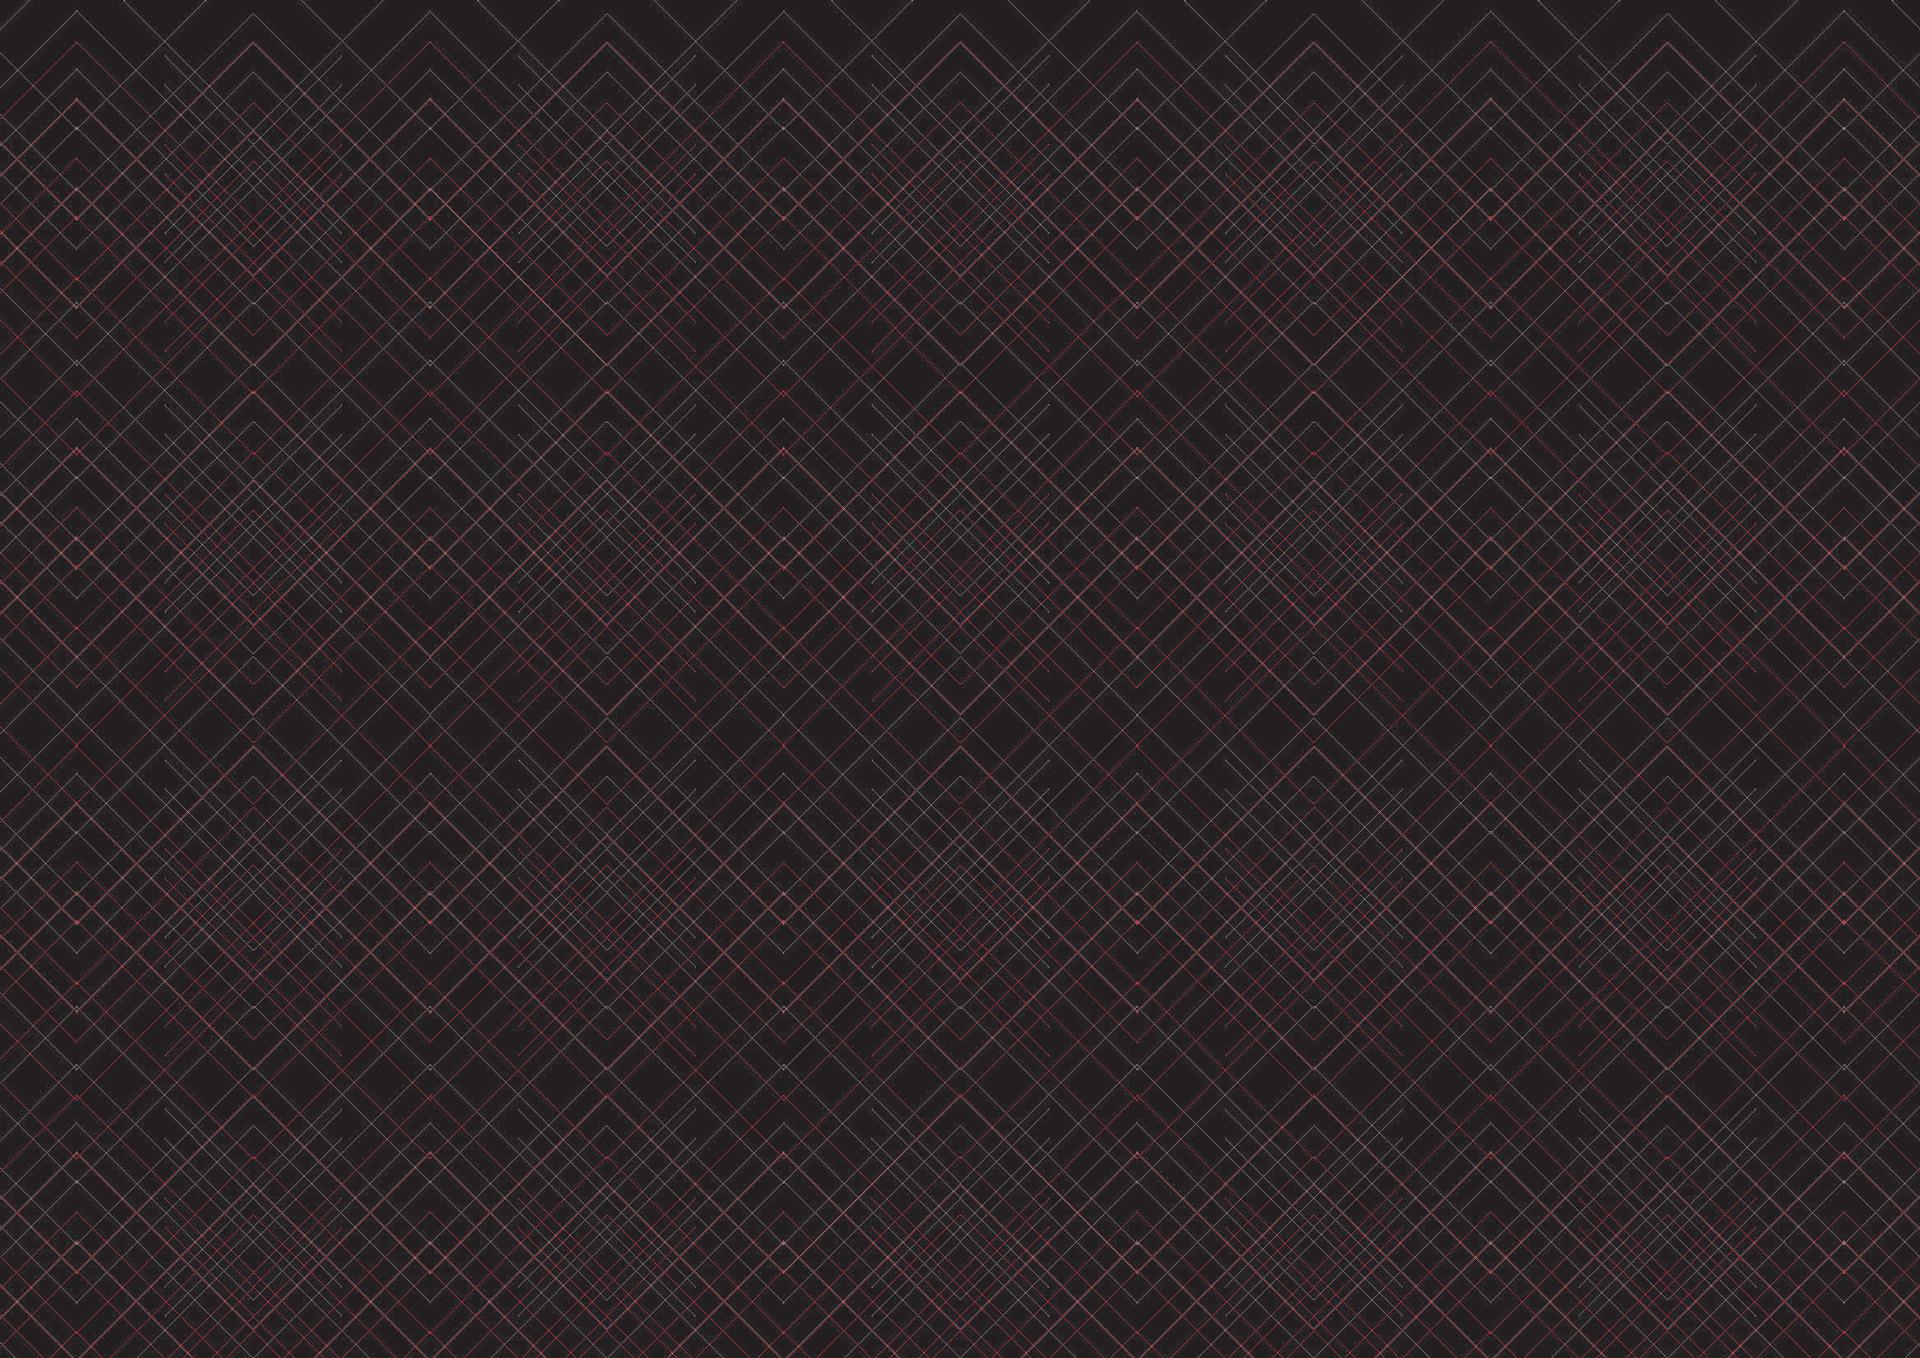 pattern_04